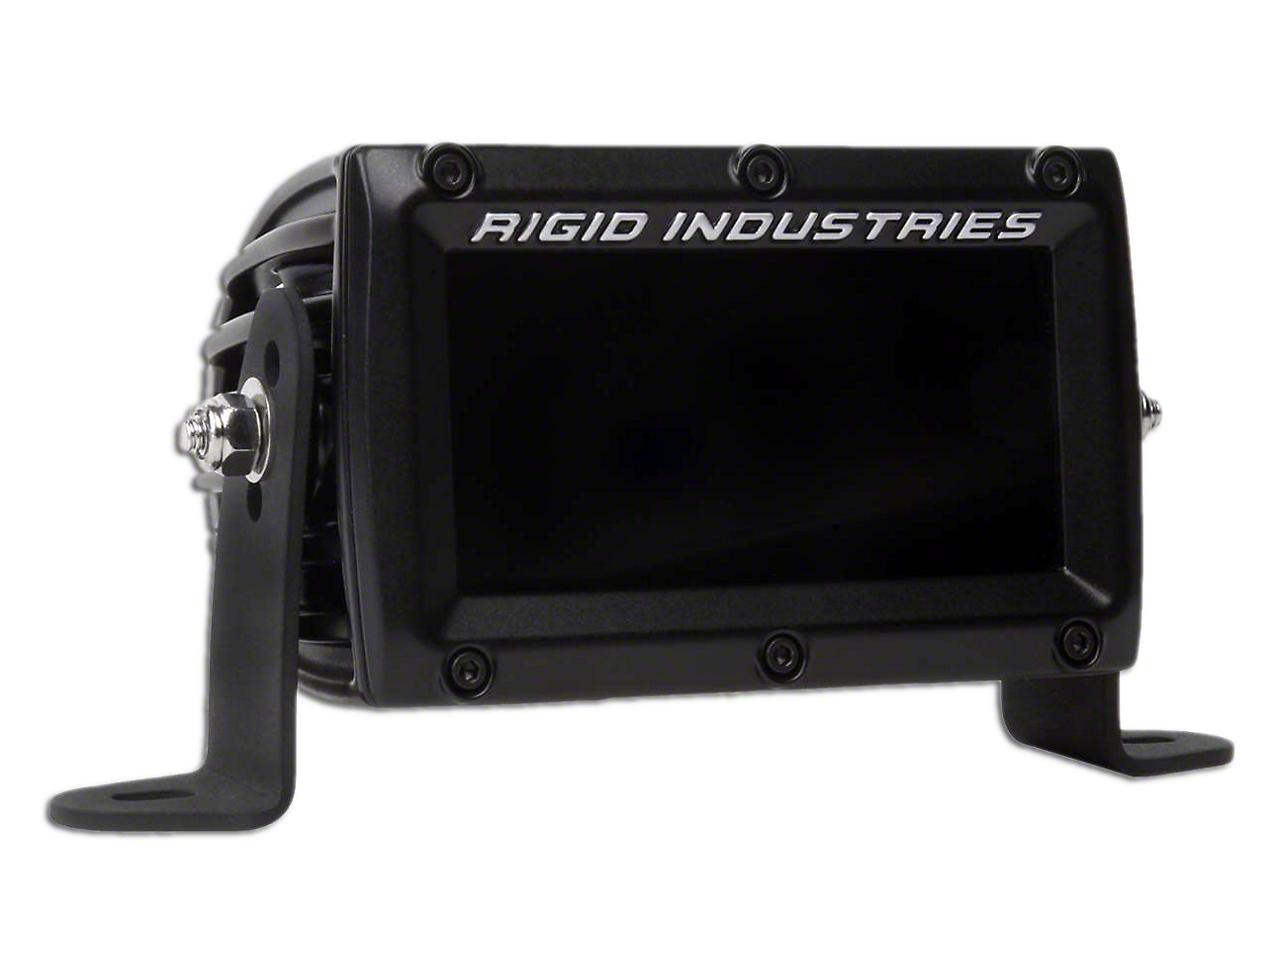 Rigid Industries 4 in. E-Series Infrared LED Light Bar - Flood/Spot Combo